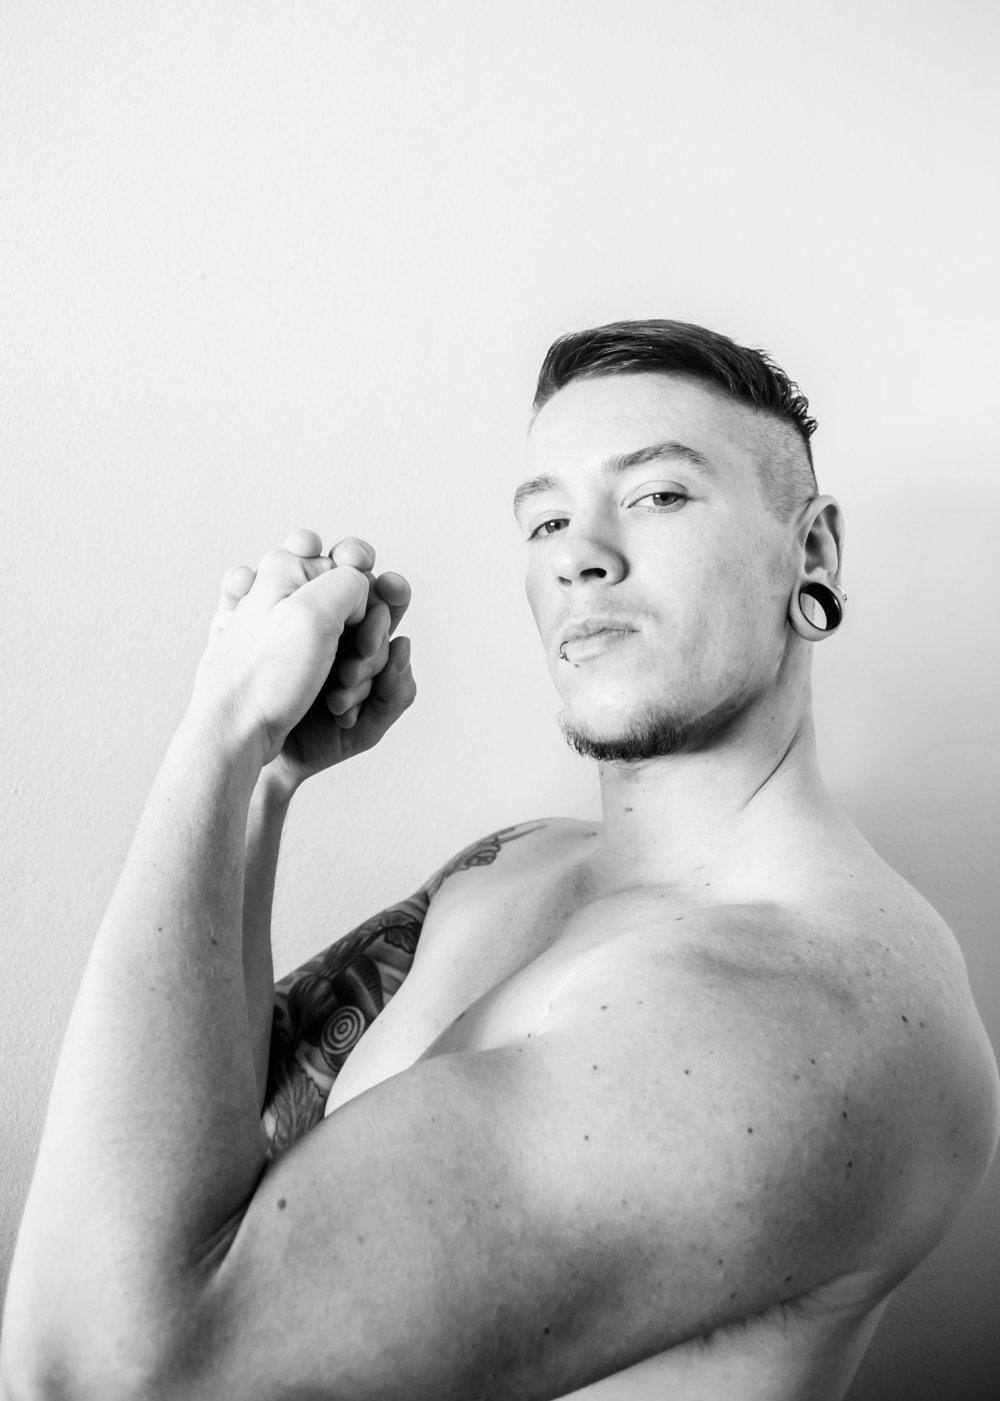 River-Runs-Wild-FTM-Fitness-Bodybuilding-Trans-Man-Transgender-Transition-Bulking-Muscle-Size-Get-Big-Grow-Strength-Lifting.jpeg